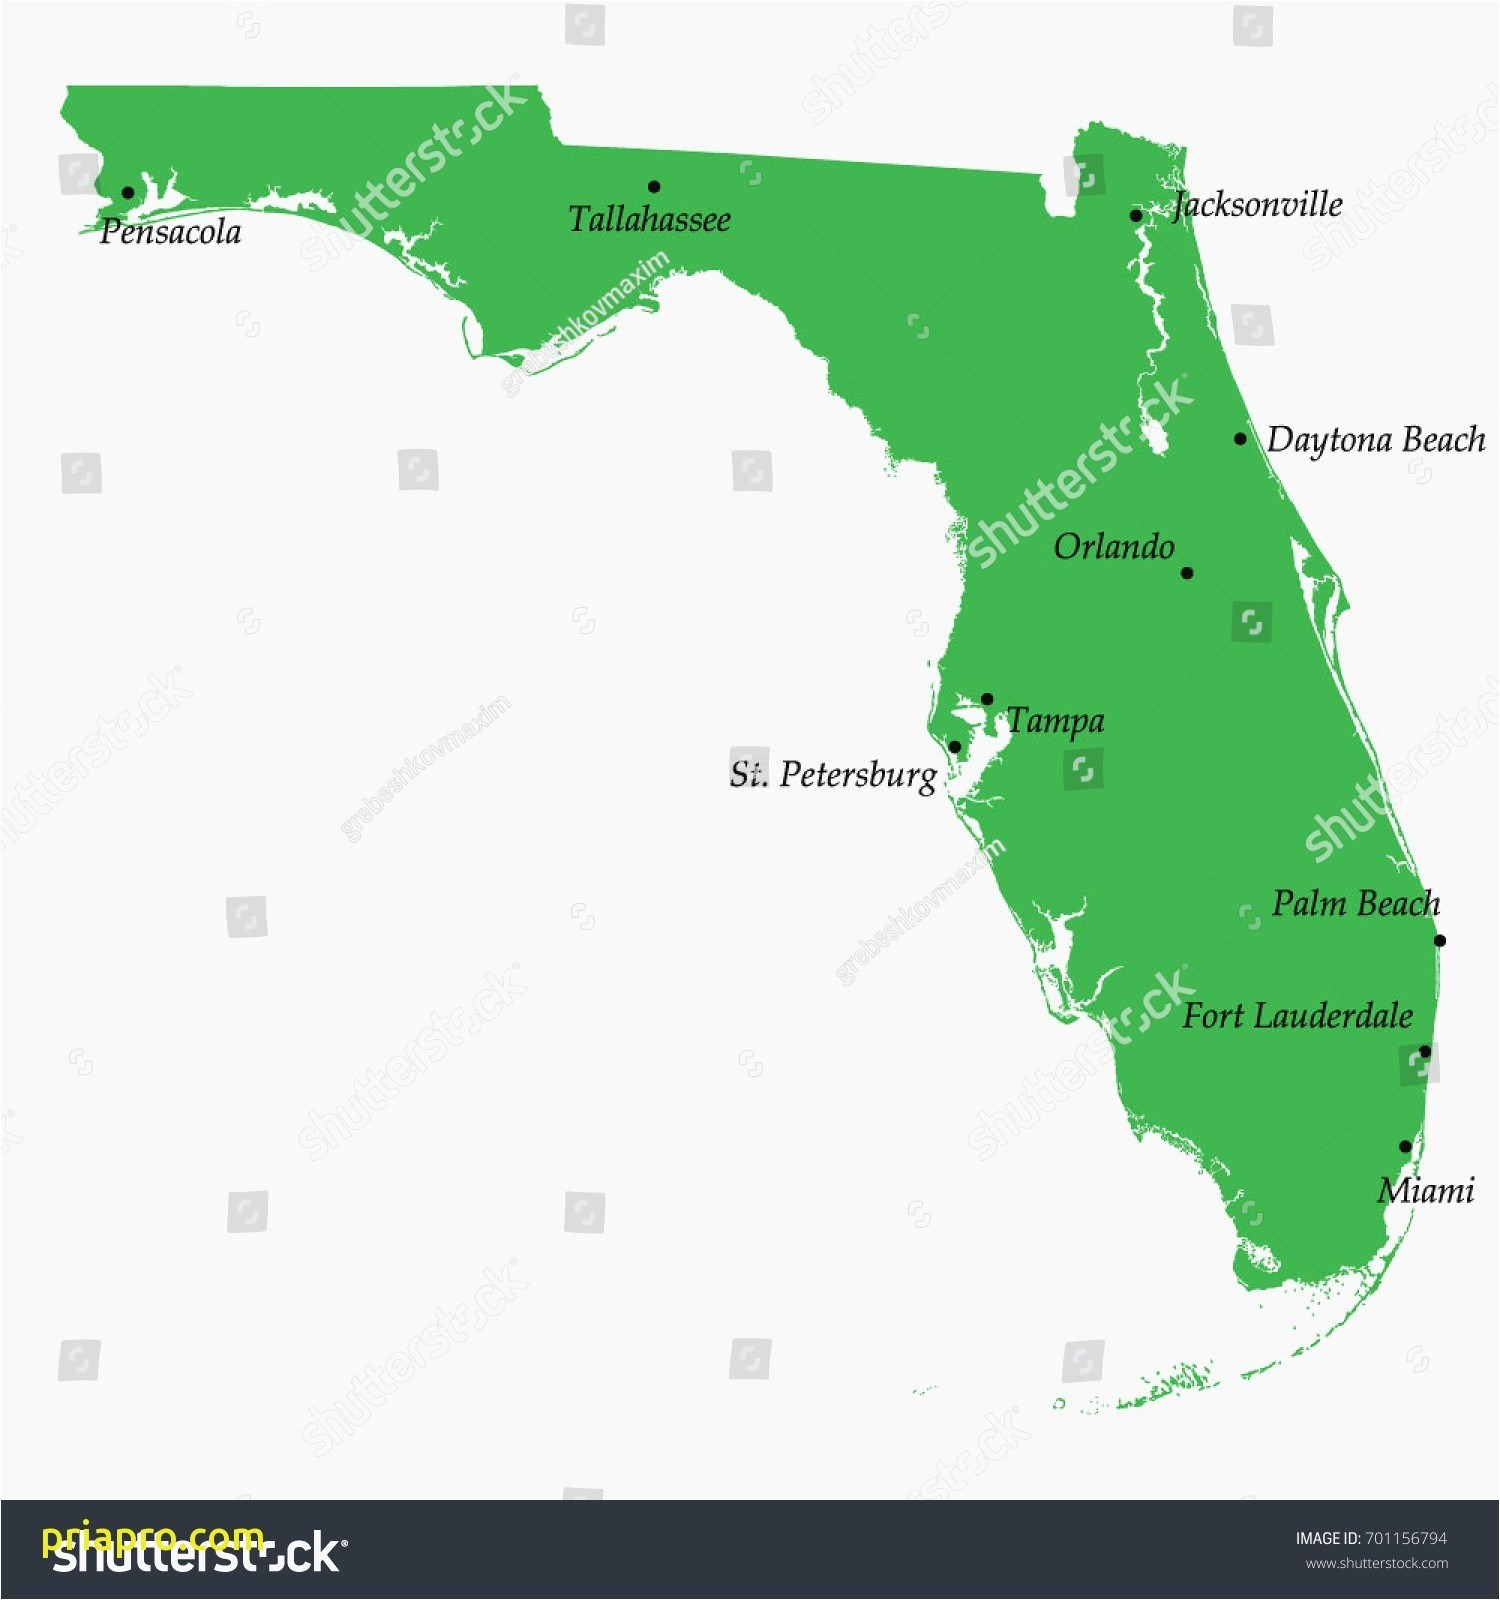 Street Map Ormond Beach Fl - Street Map Of Ormond Beach Florida